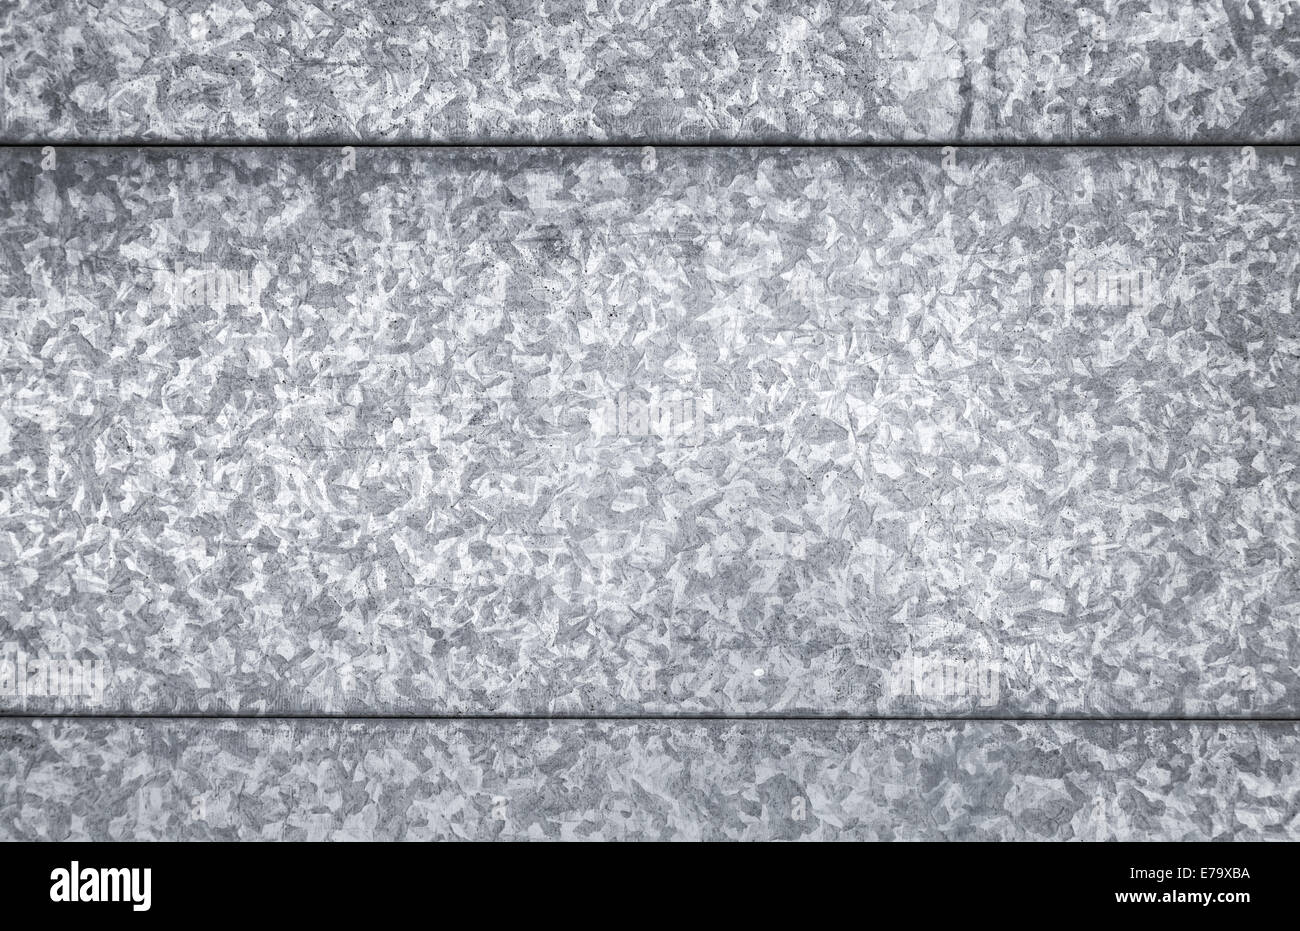 gray galvanized steel sheet background photo texture